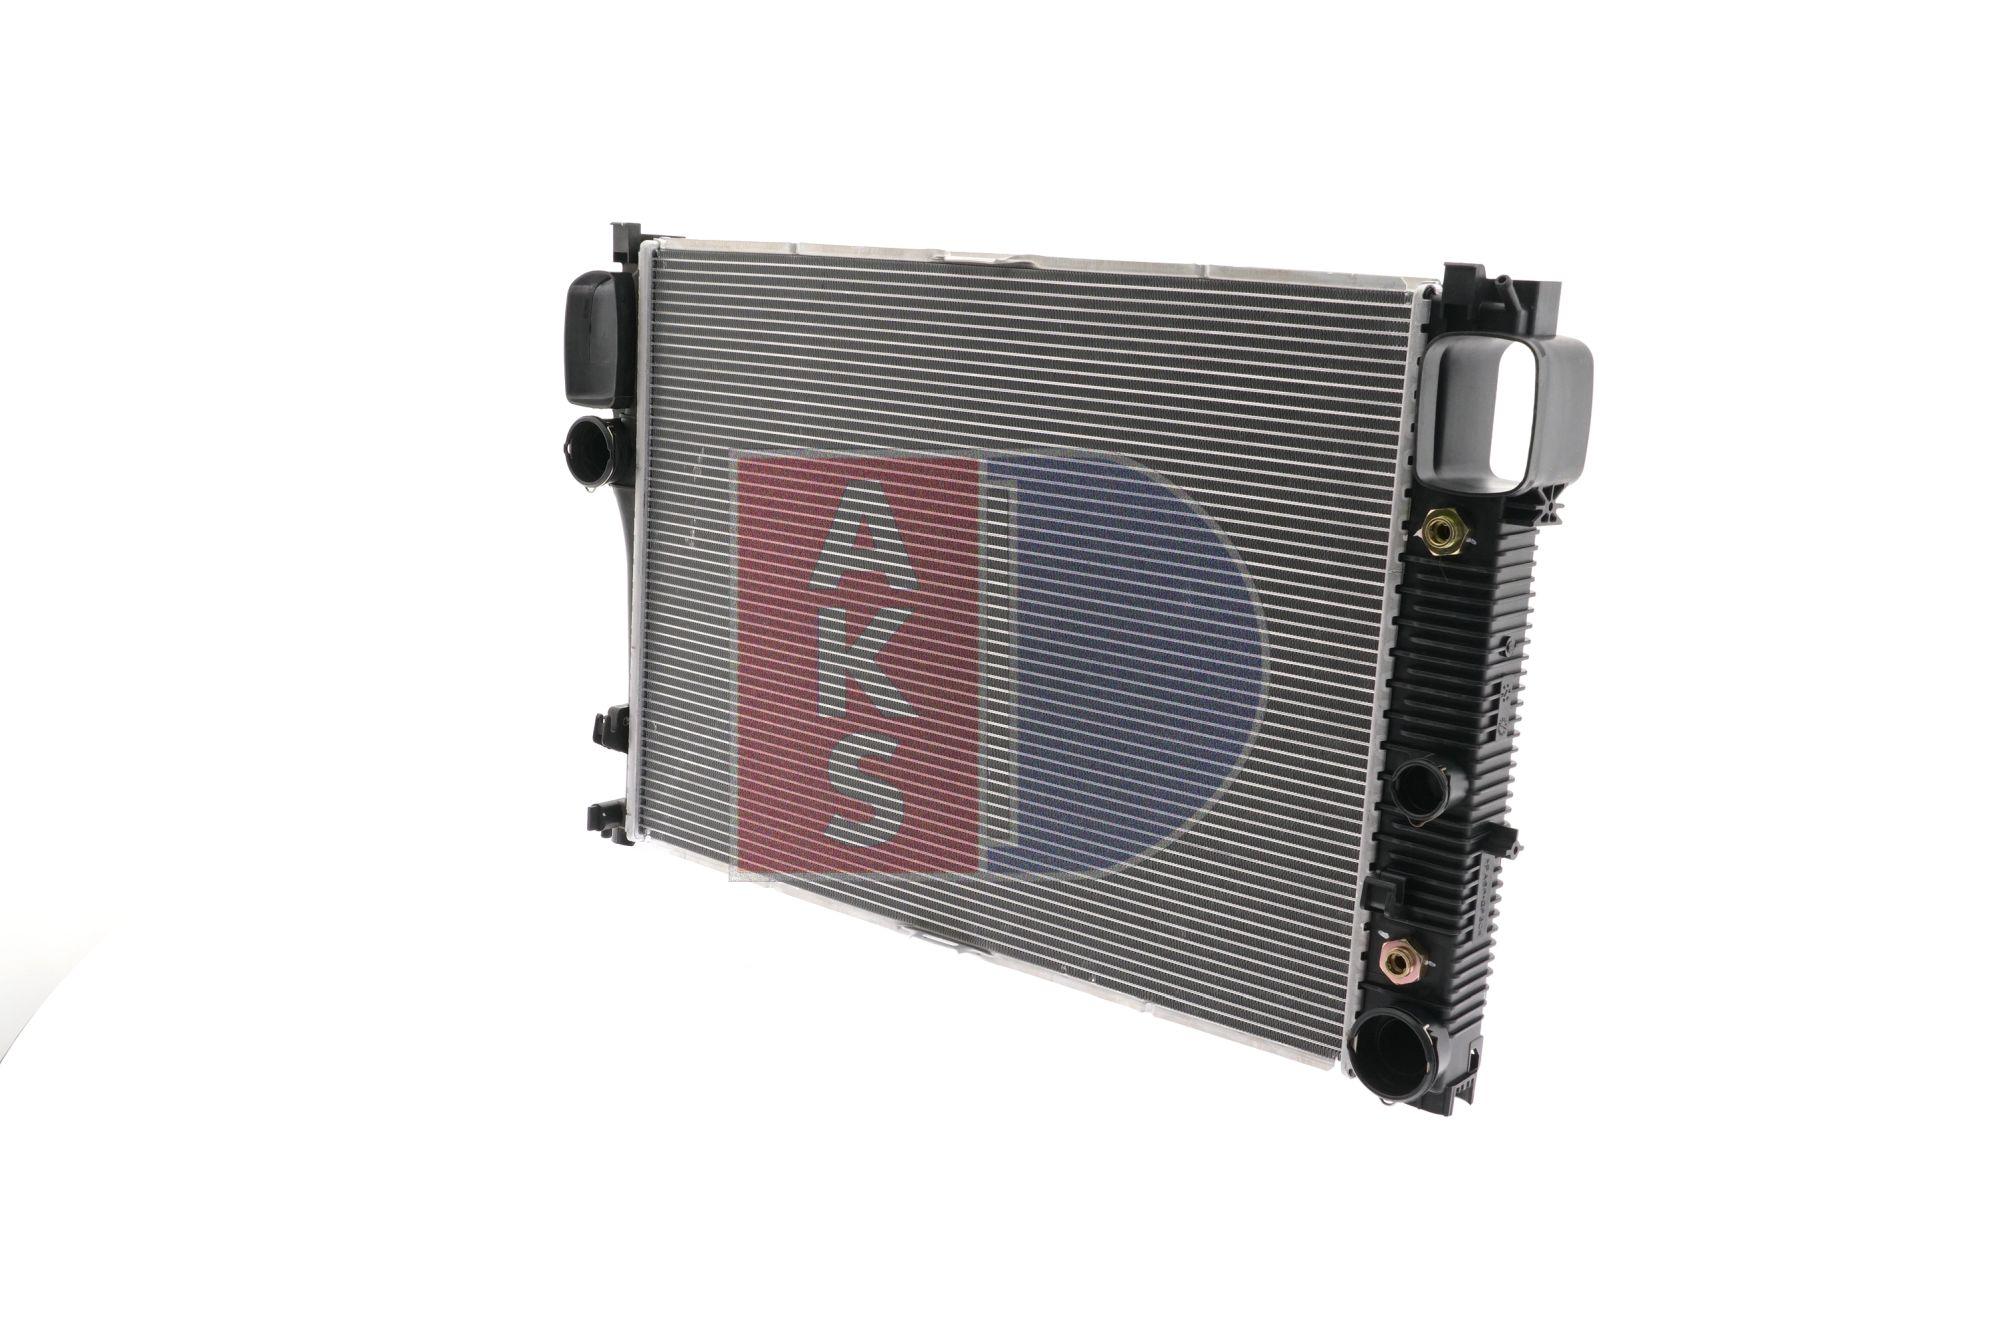 120057N AKS DASIS Kühlrippen gelötet, Aluminium Netzmaße: 638x445x34 Kühler, Motorkühlung 120057N günstig kaufen